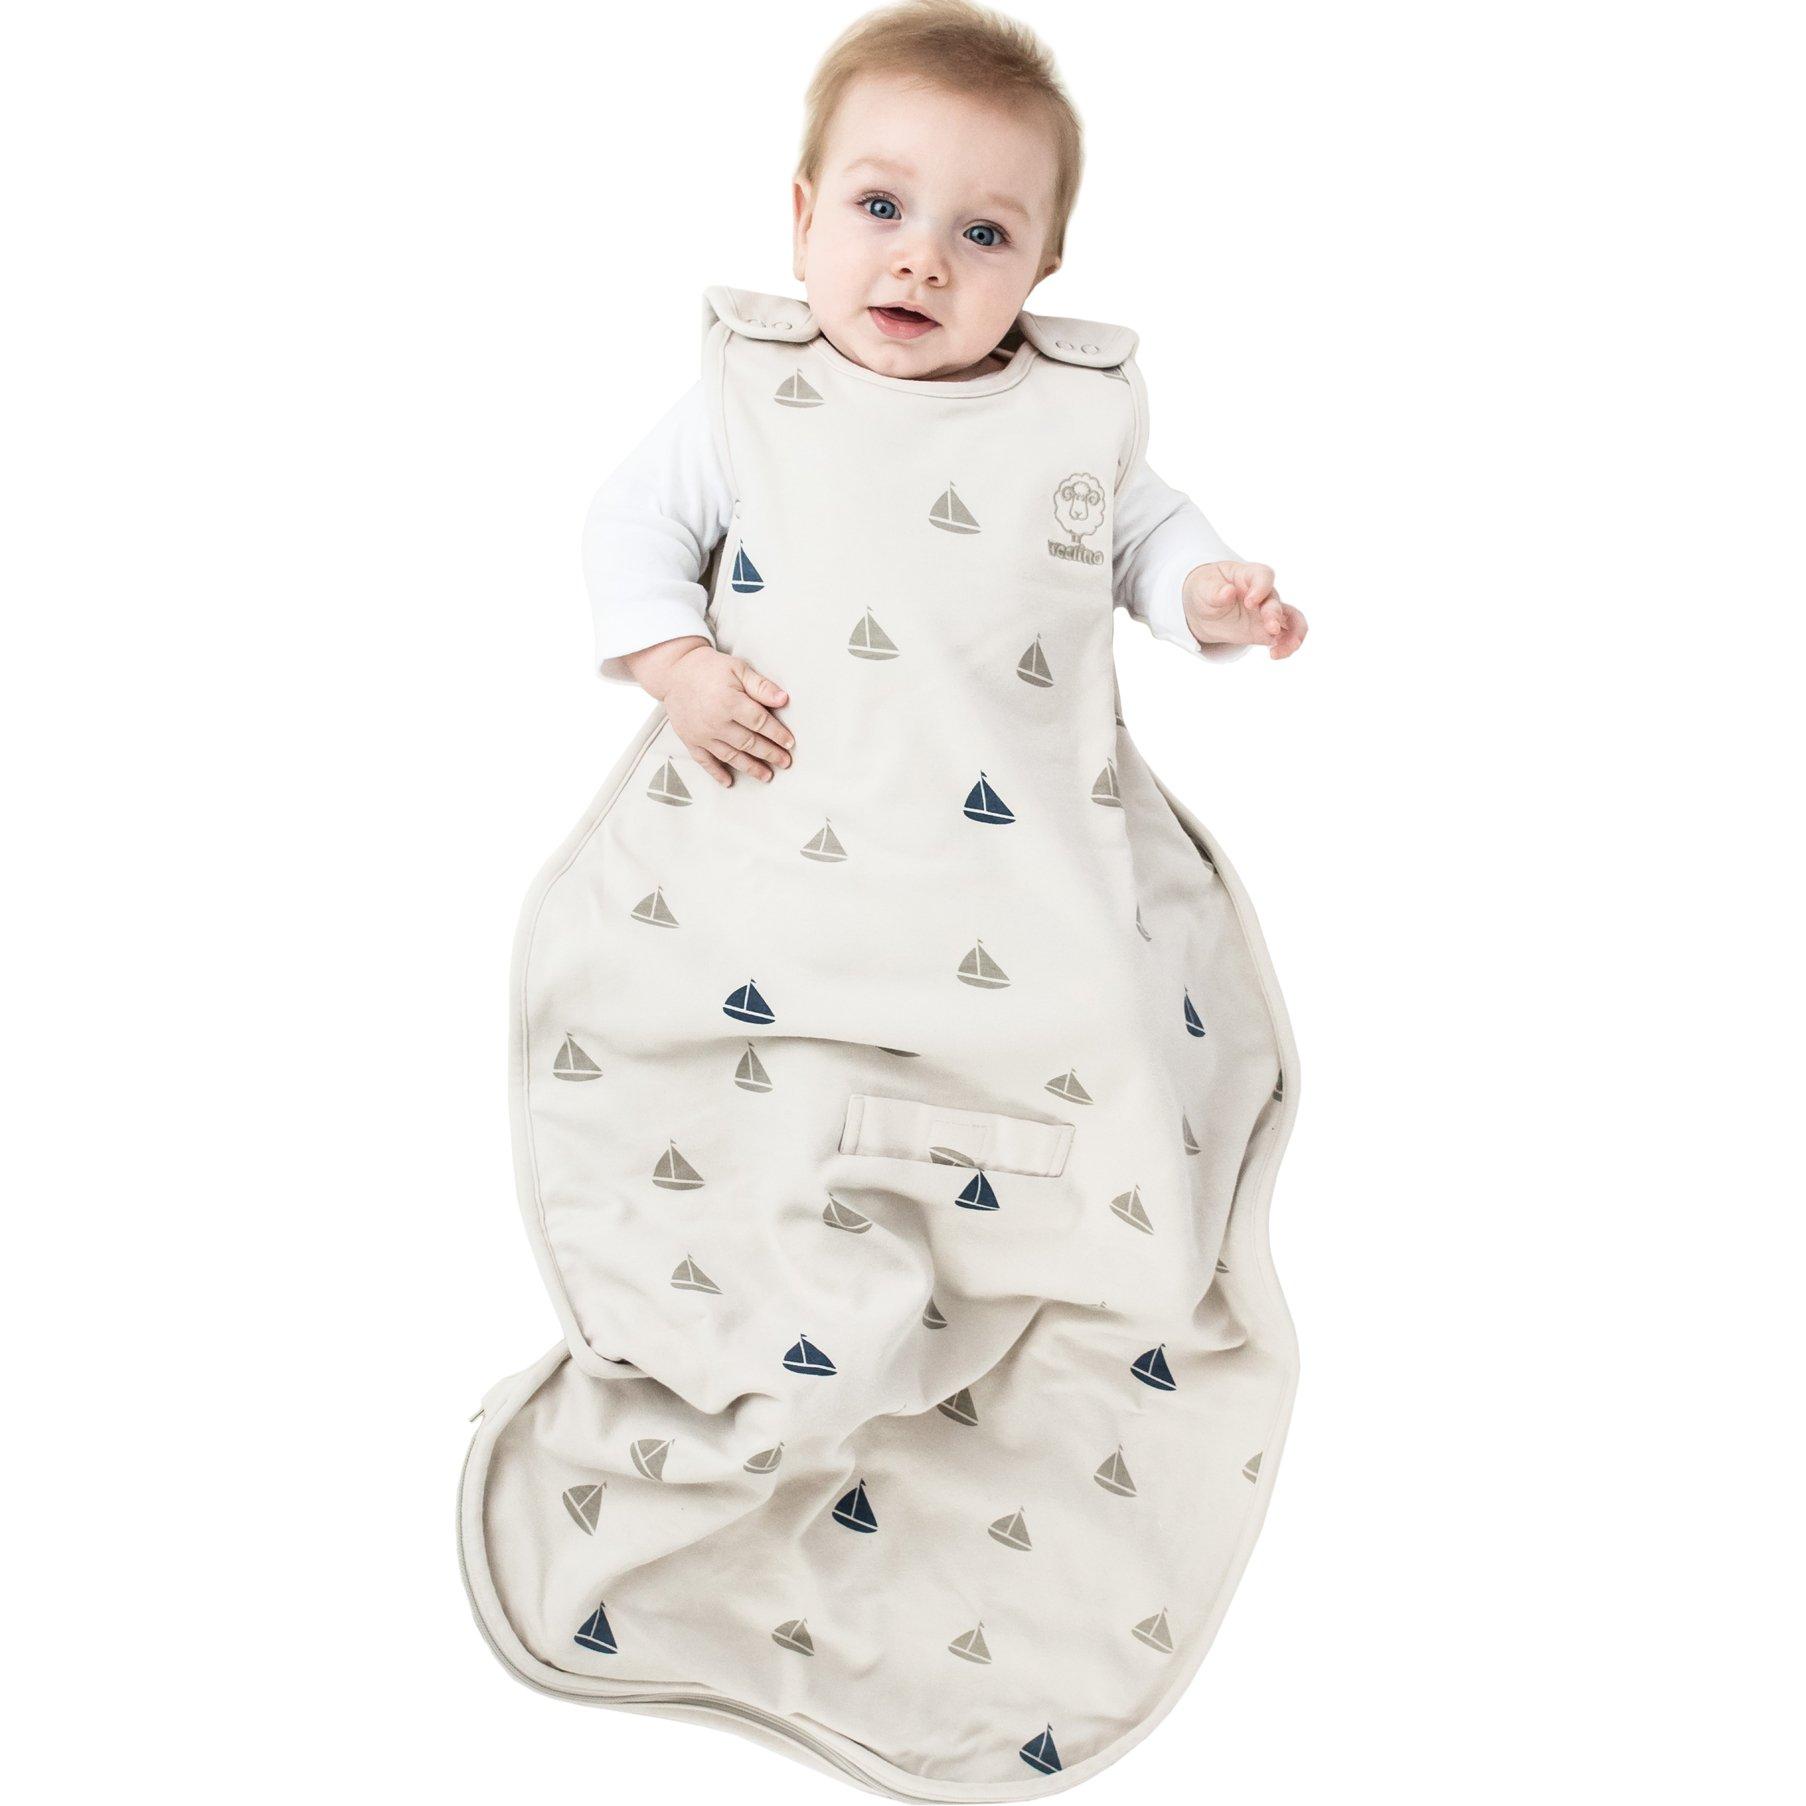 Woolino Baby Sleep Bag Or Sack by 4 Season Merino Wool Wearable Blanket Gown, 2-24 Months, Boats